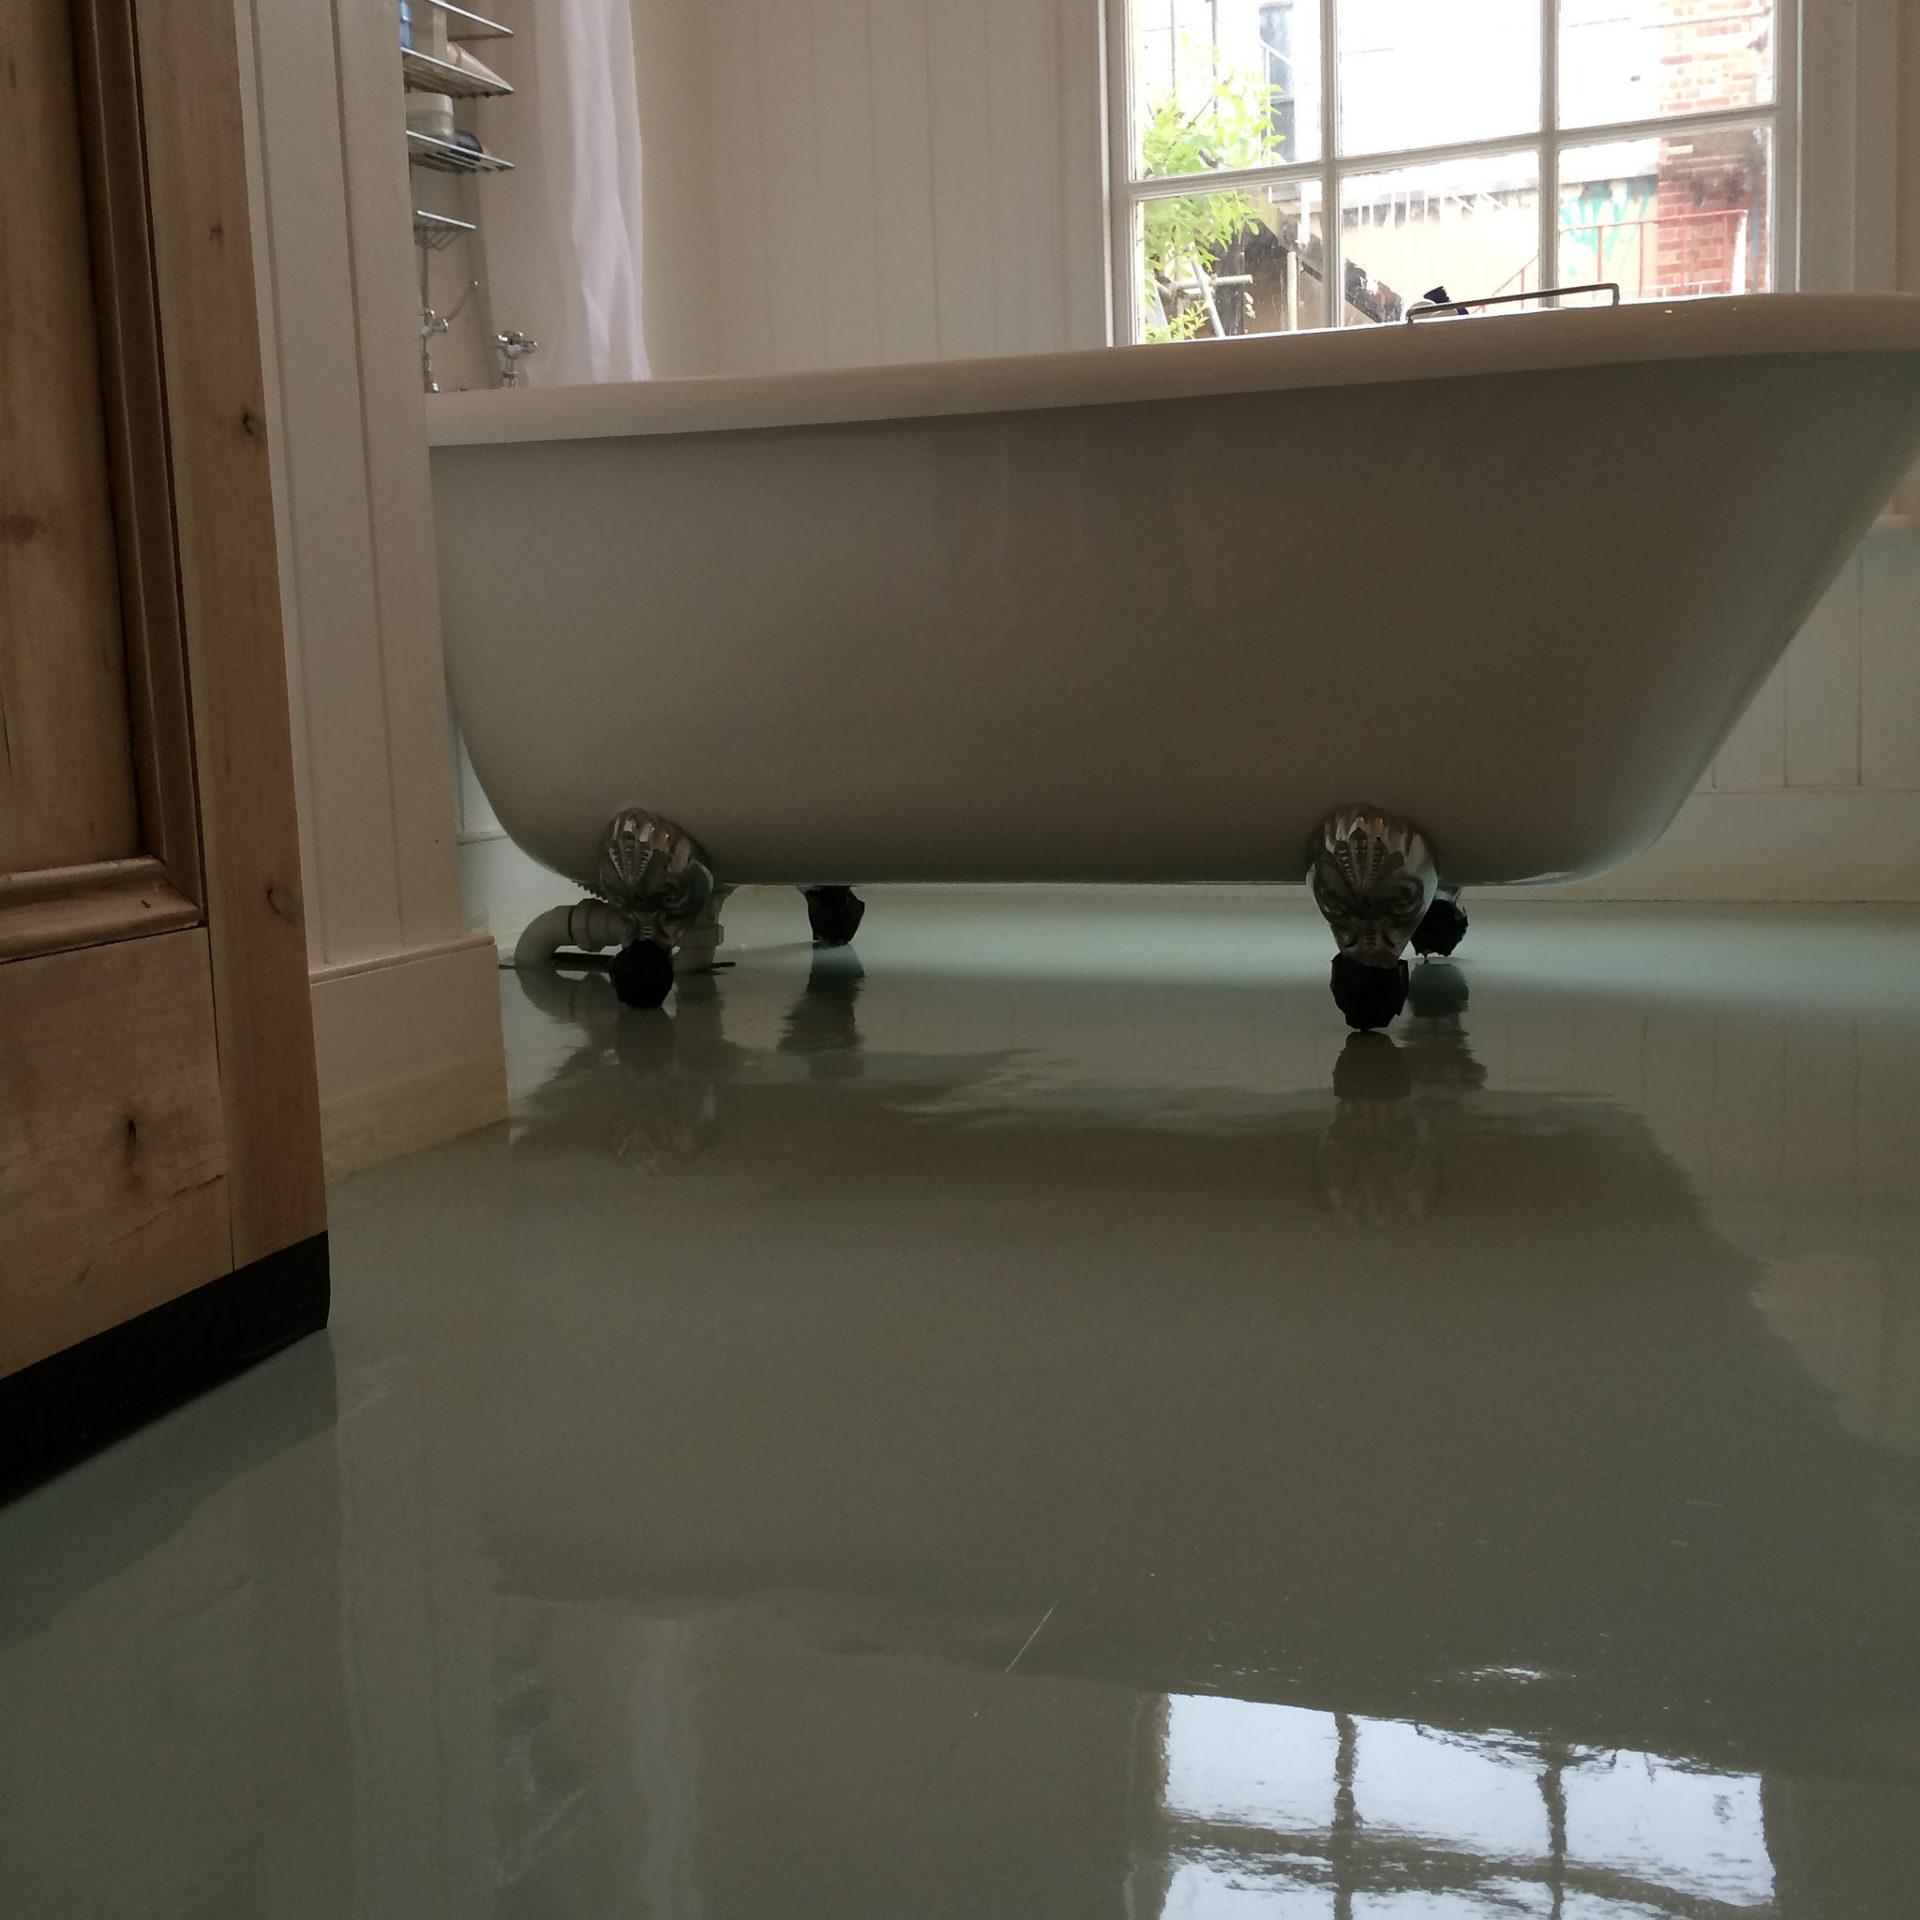 Vinyl bathroom floor cleaner sealer brighton hove east for Best vinyl floor sealer